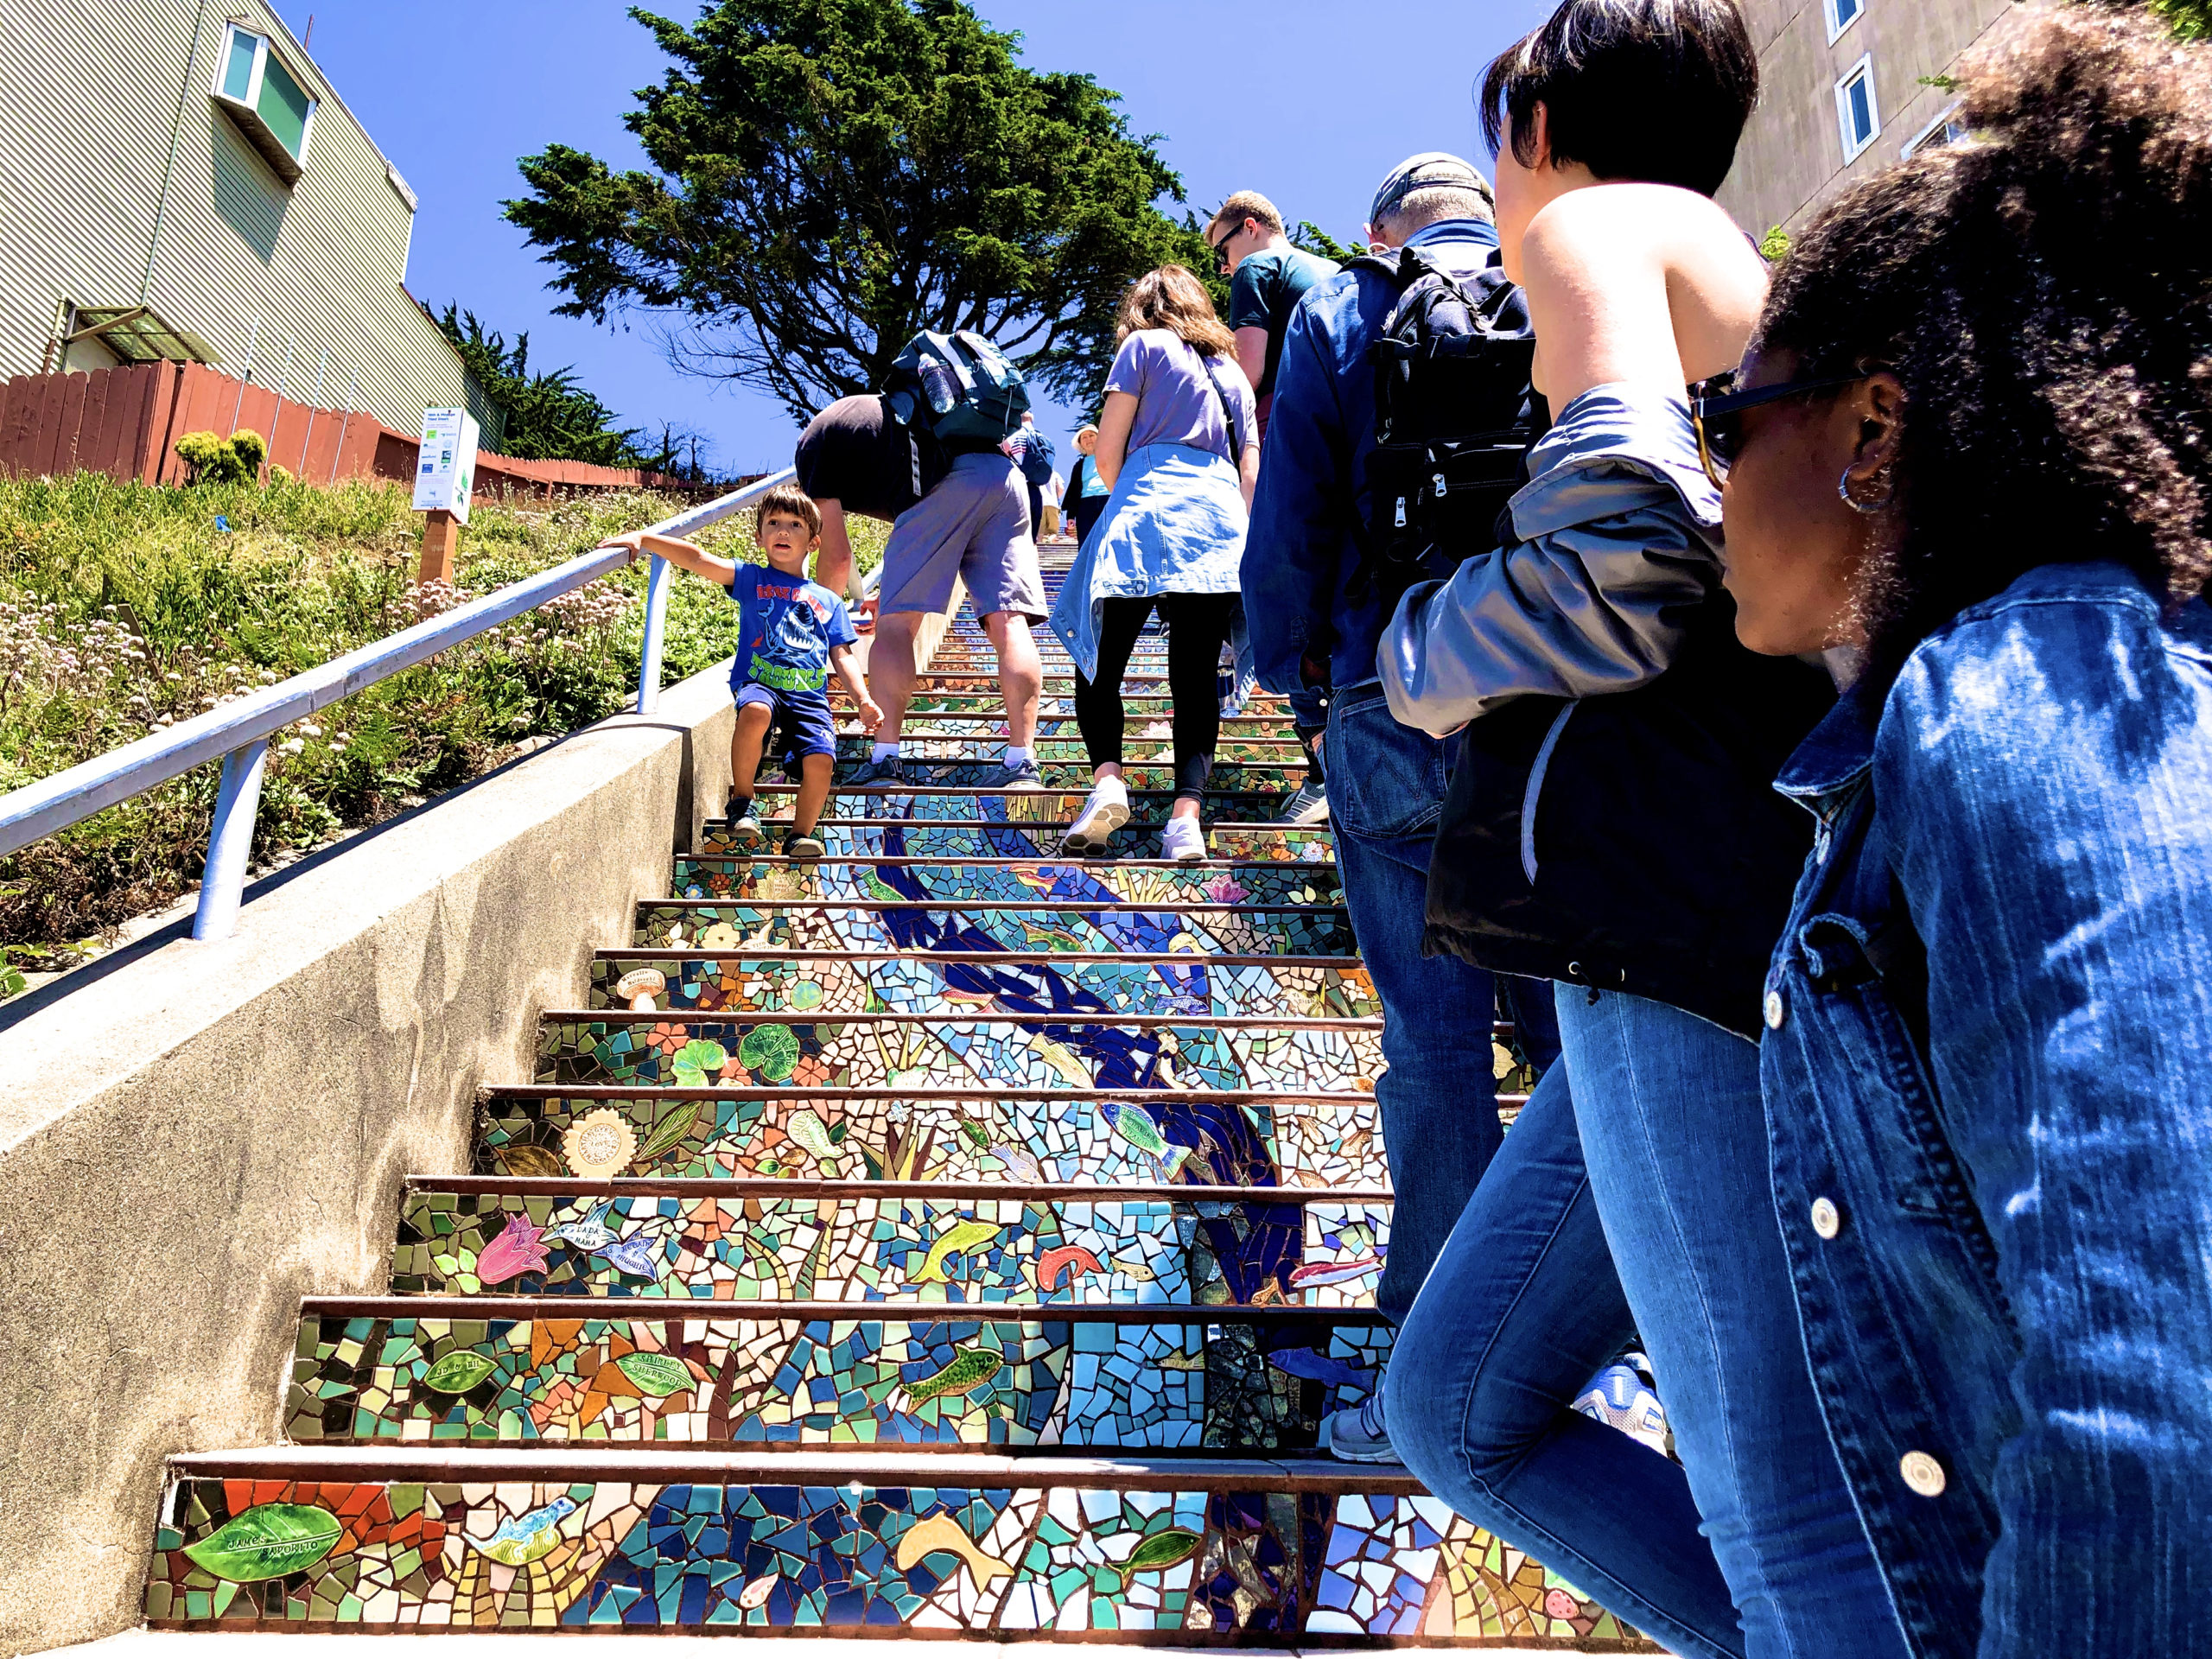 tour group climbing up 16th Avenue mosaic steps